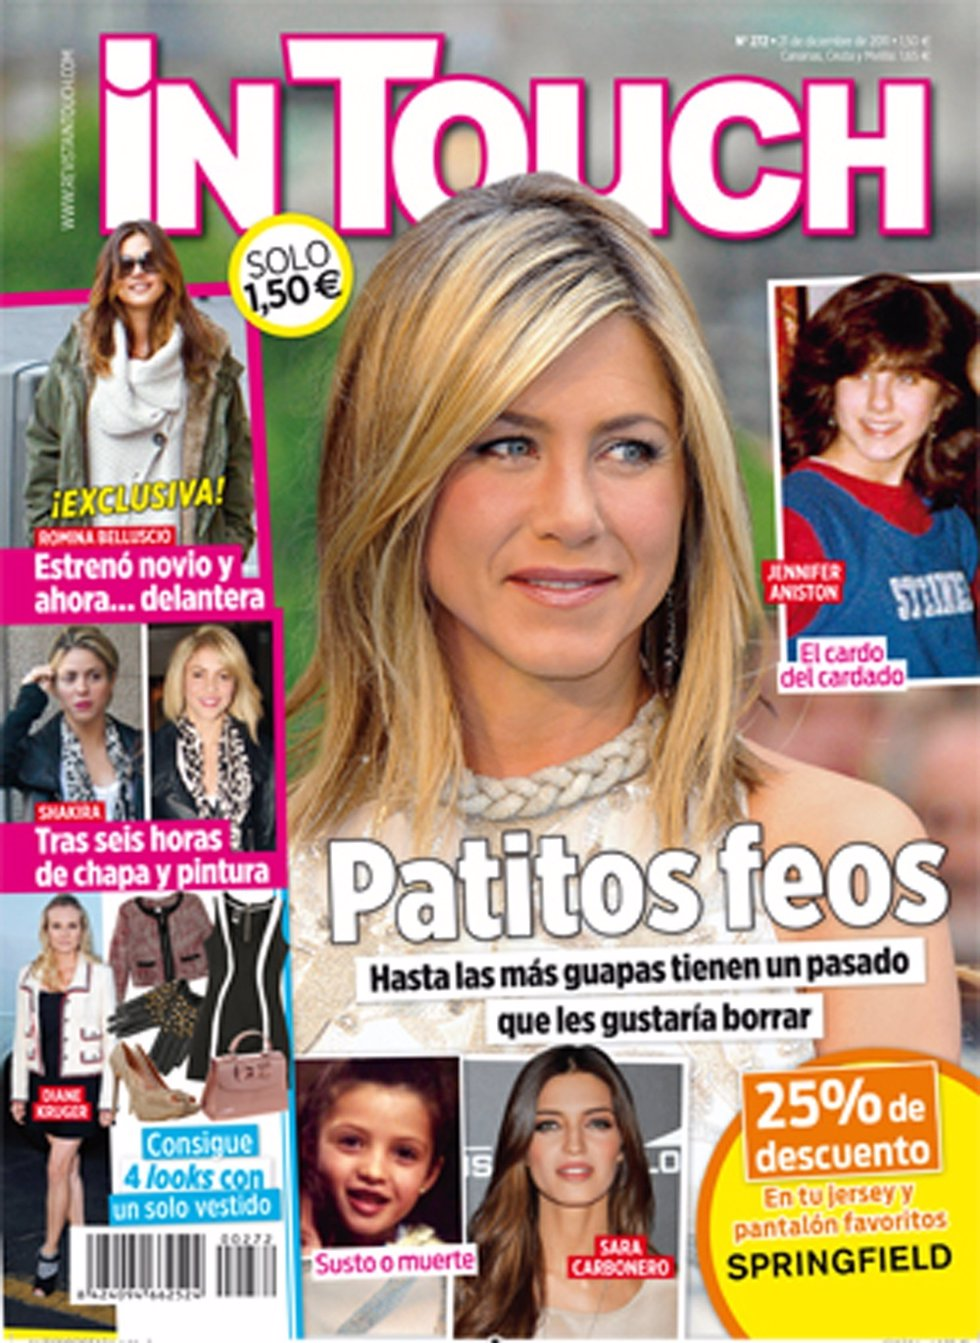 Portada De La Revista 'Intouch'